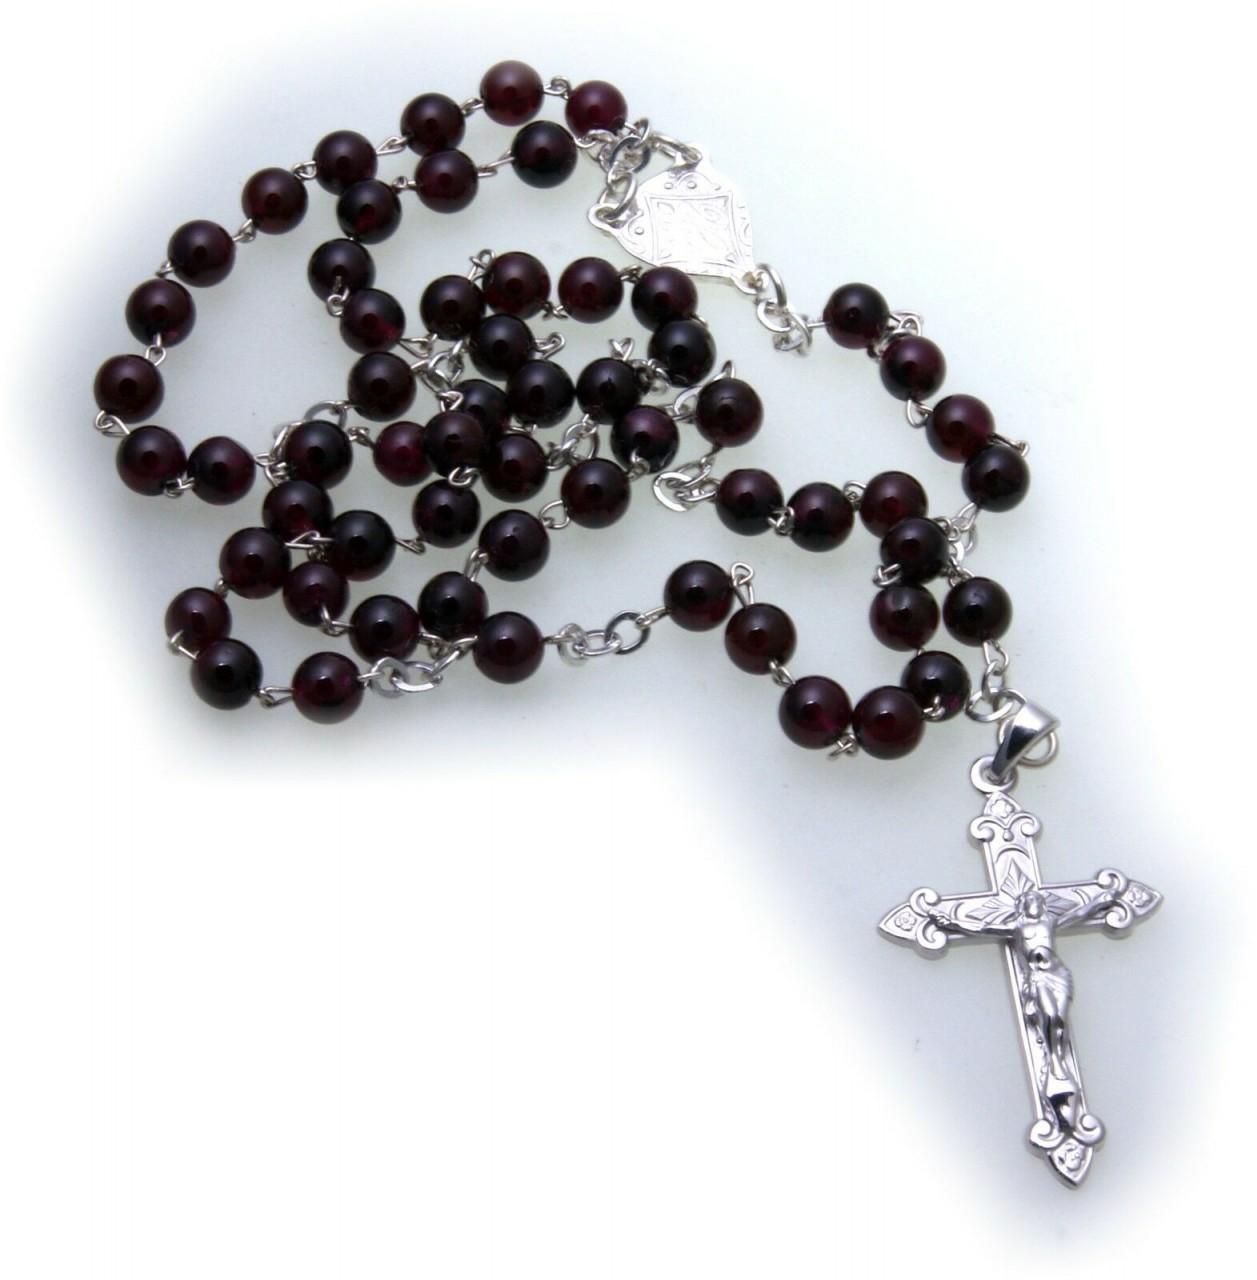 Halskette Rosenkranz Kreuz Jesus Silber 925 Sterlingsilber Granat Kugel 50 cm